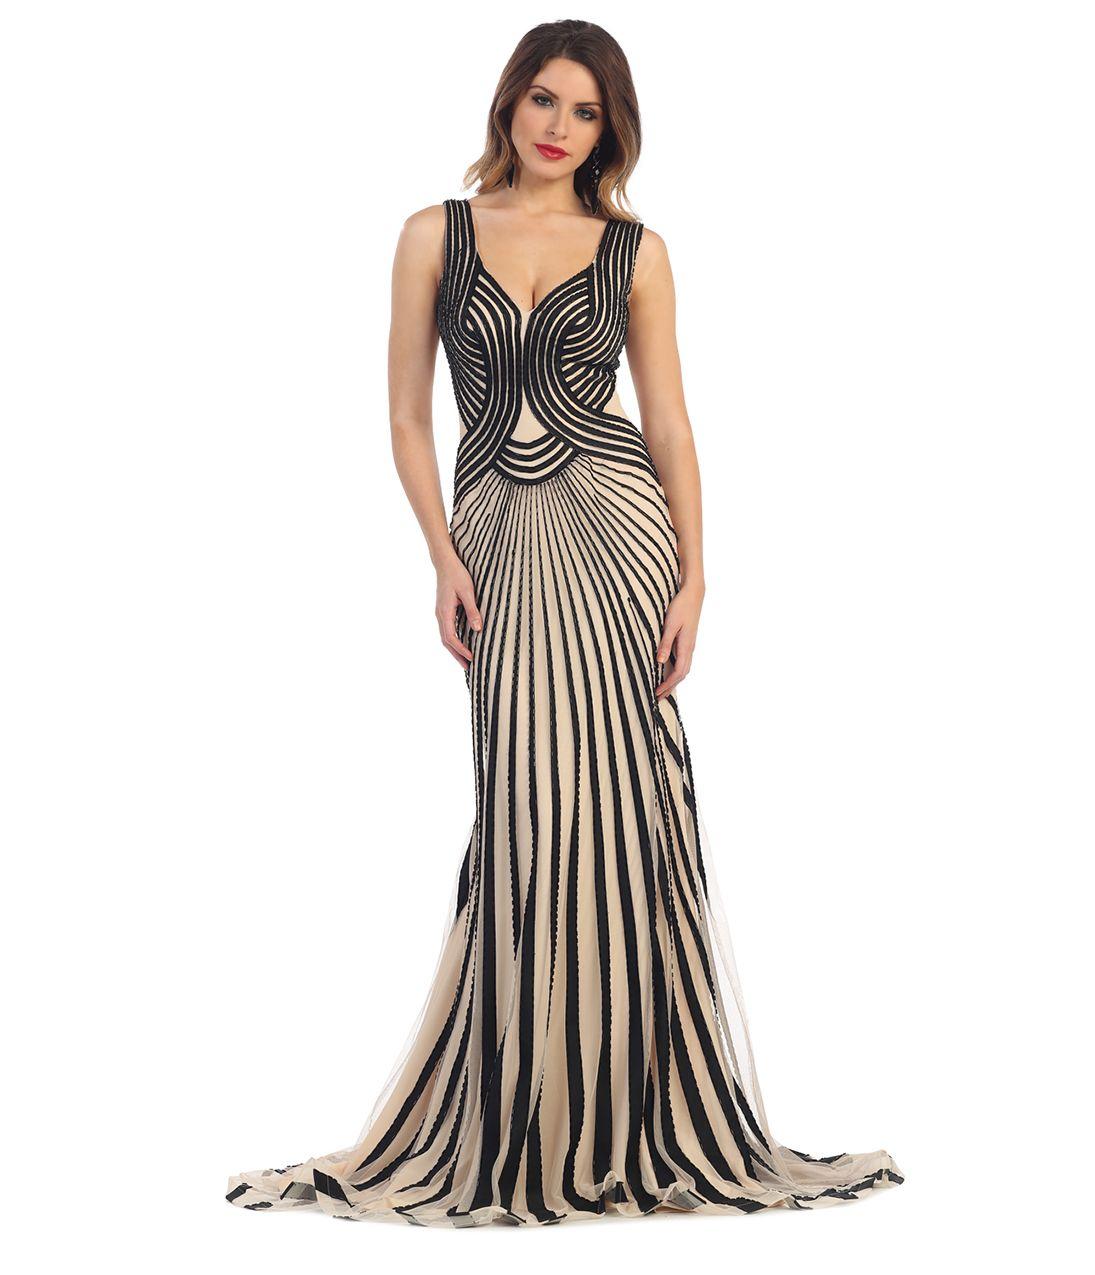 1930s Evening Dress Art Deco Gown Party Dress 1930s Dress Evening Dresses Evening Dresses [ 1275 x 1095 Pixel ]